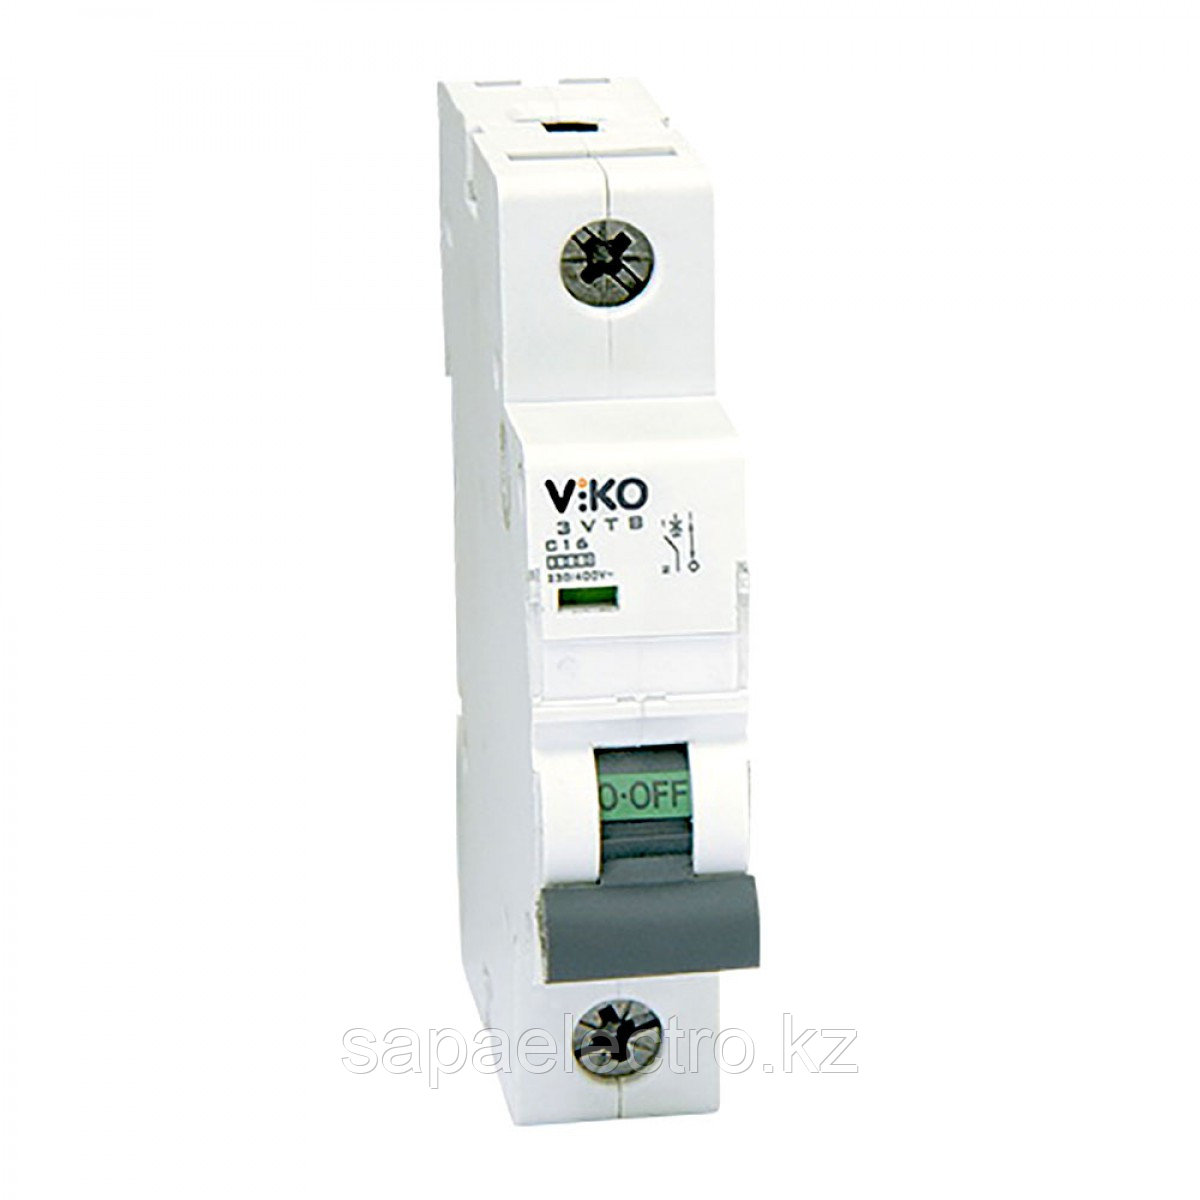 3VTB-1B16  Автомат 1P  16A  3KA B-C  (VIKO) 120шт